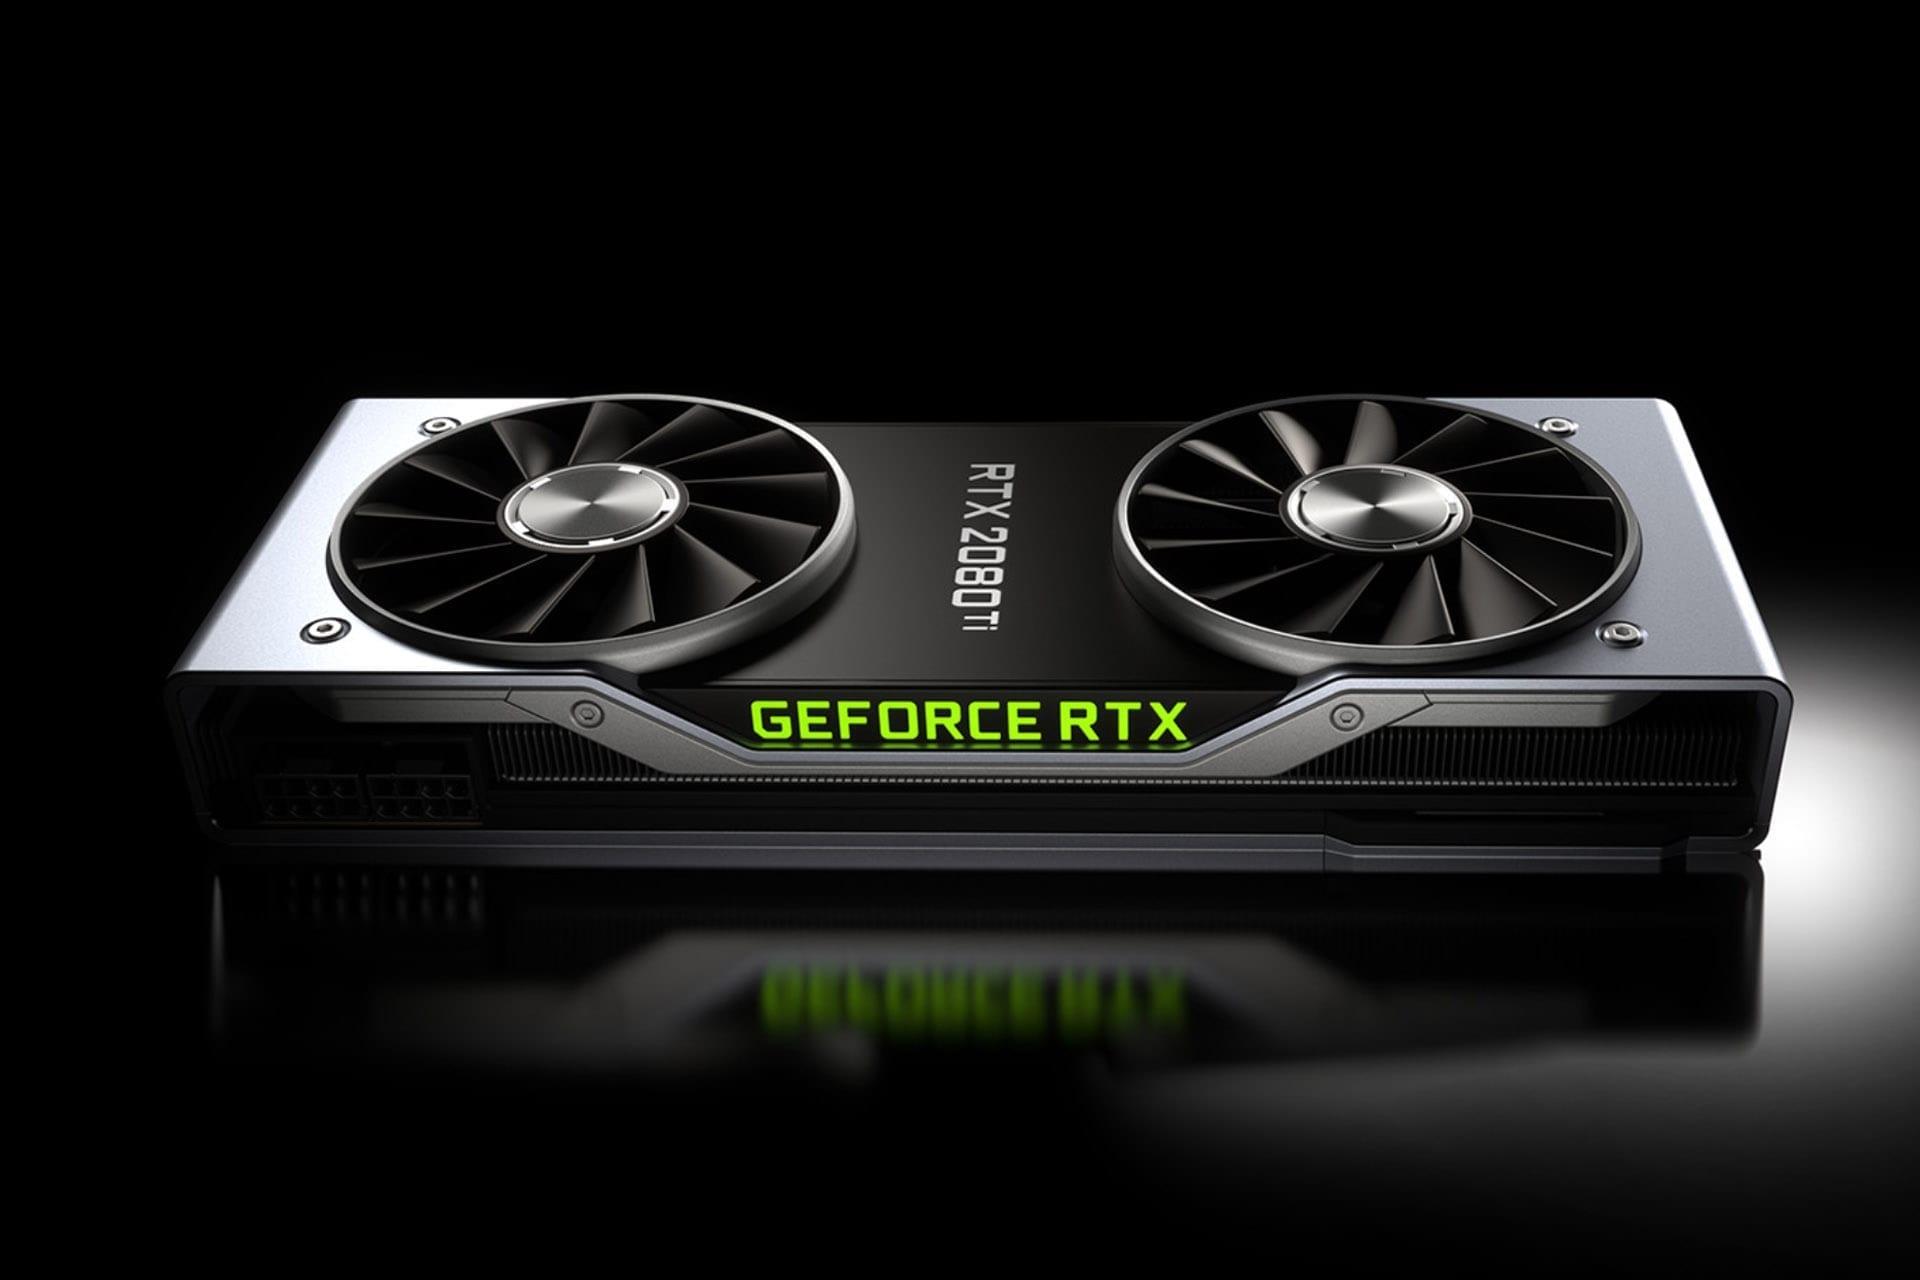 Nvidia OC RTX 2060, 2070, + 2080 GPUs